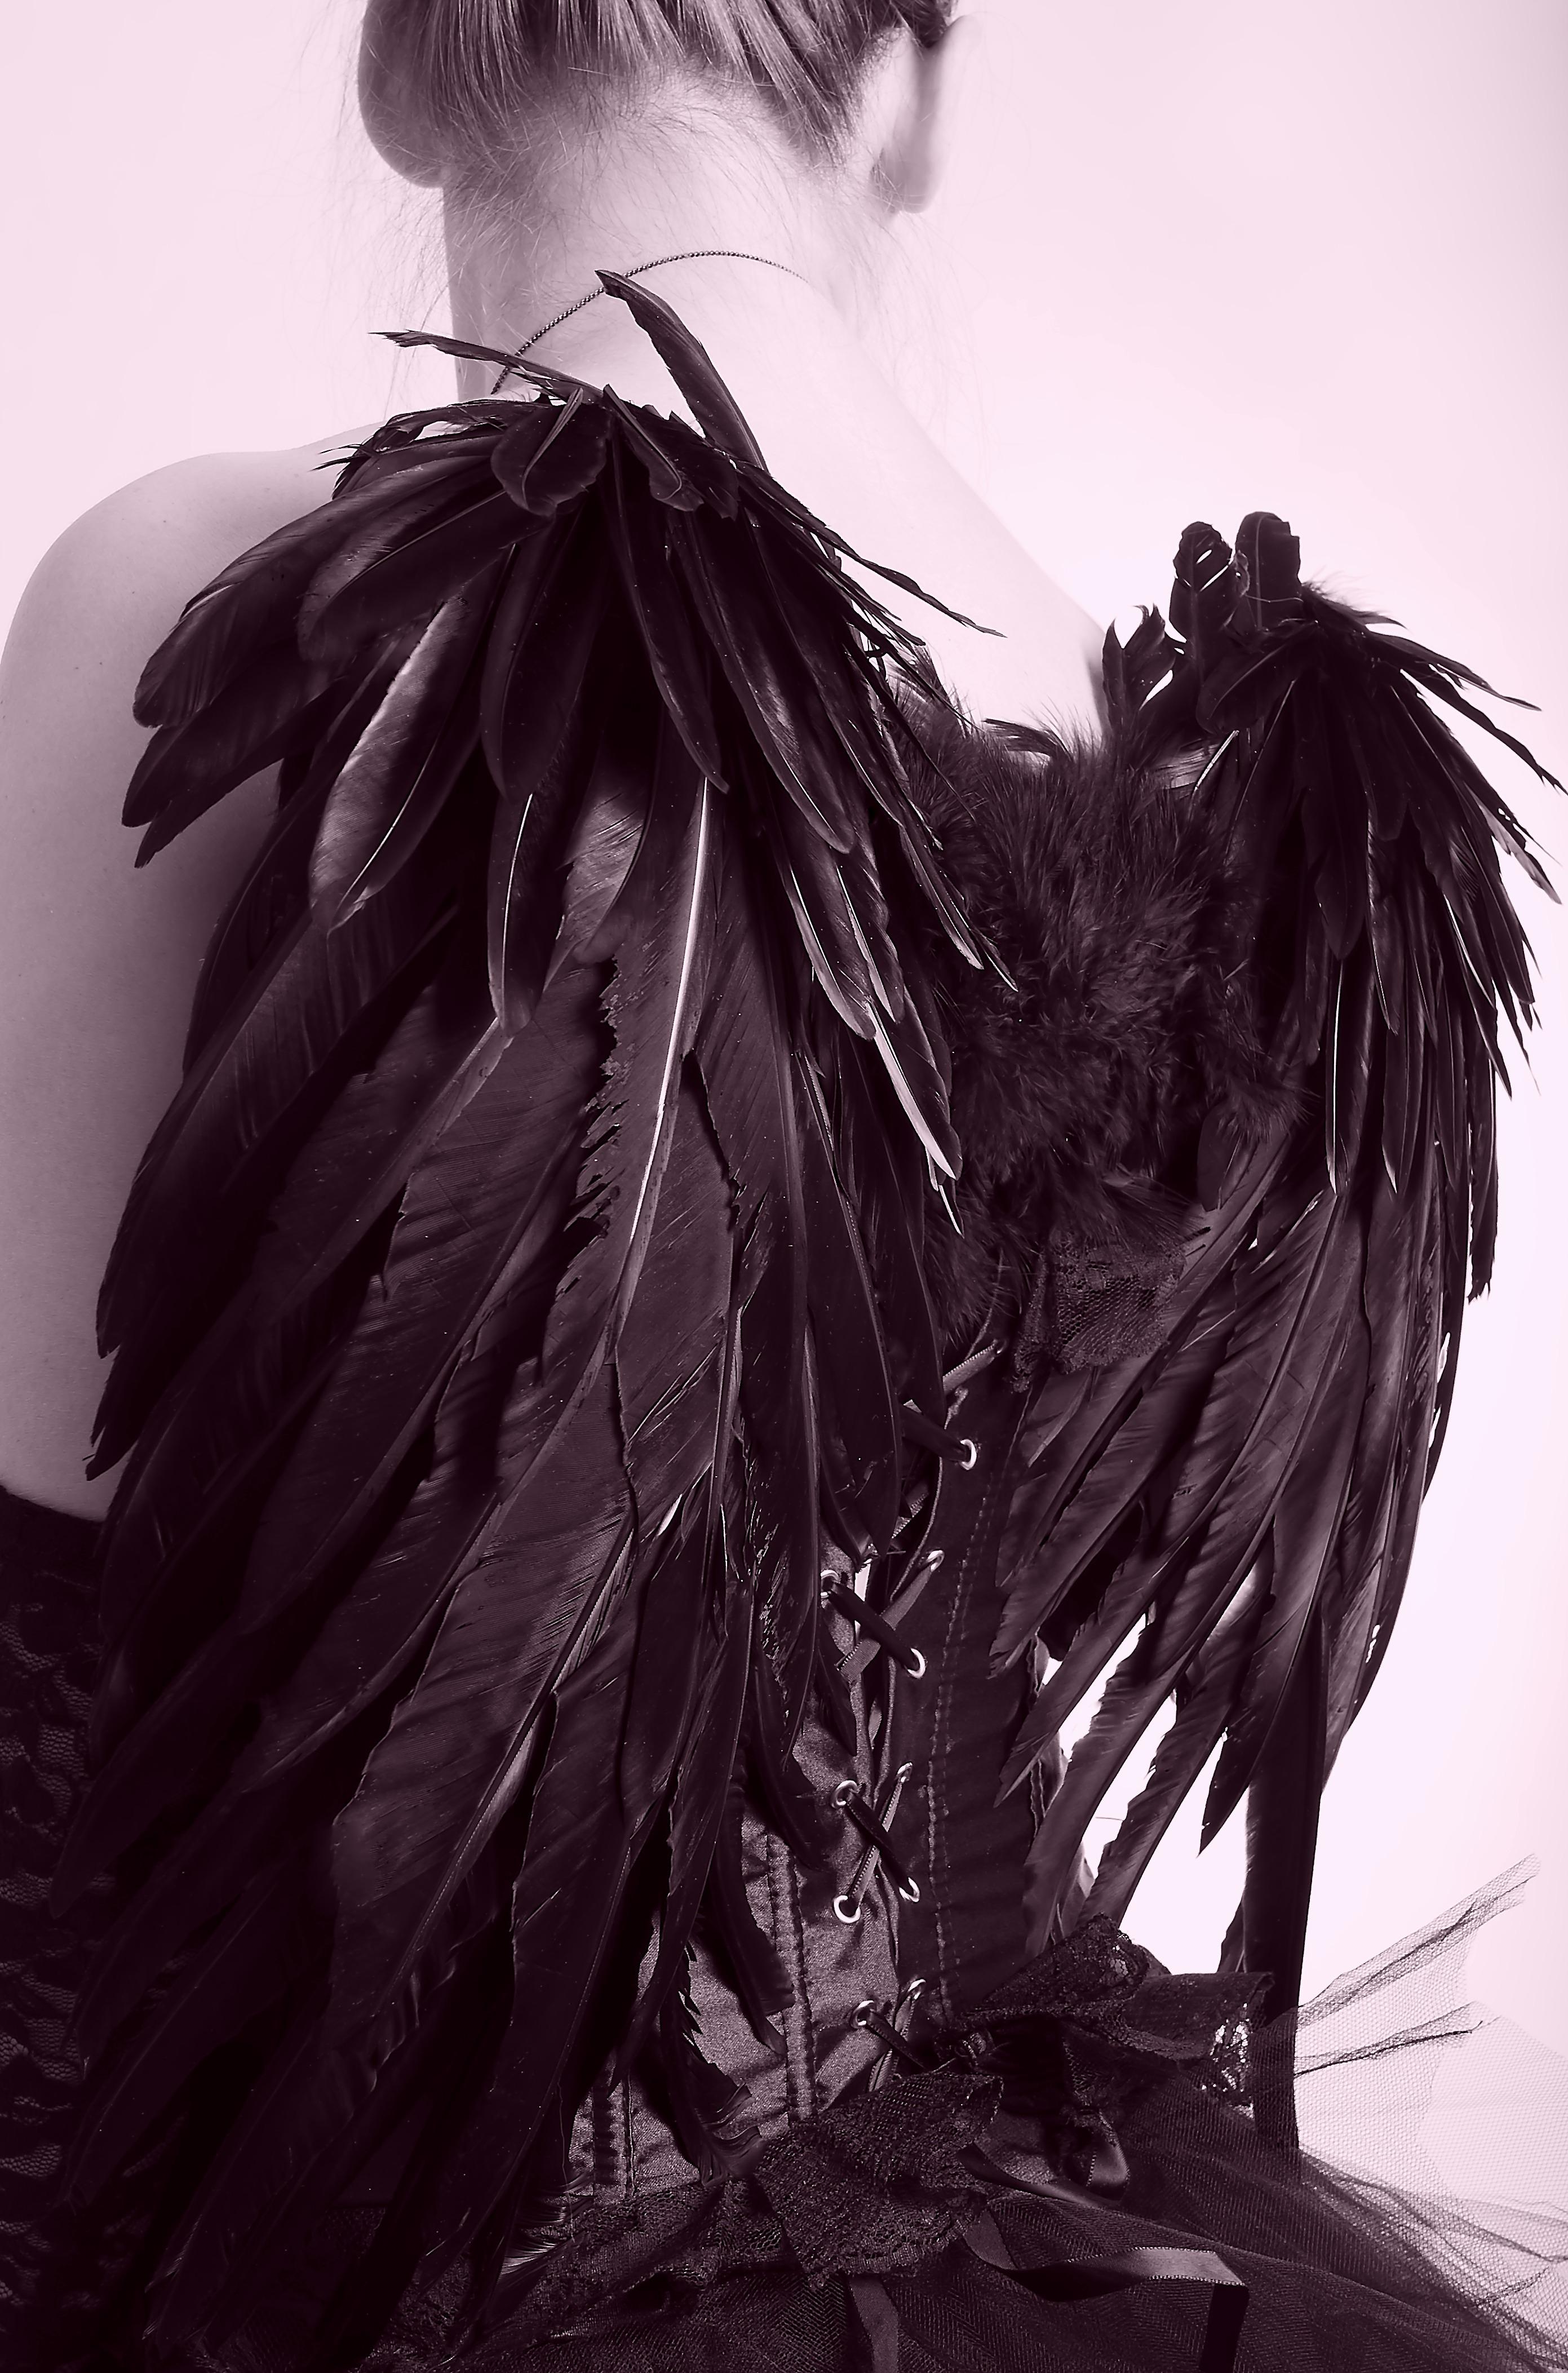 Gambar Burung Sayap Hitam Dan Putih Satu Warna Bulu Bahan Malaikat Sketsa Fotografi Monokrom Subkultur Goth Engel Hitam 2782x4210 997533 Galeri Foto Pxhere